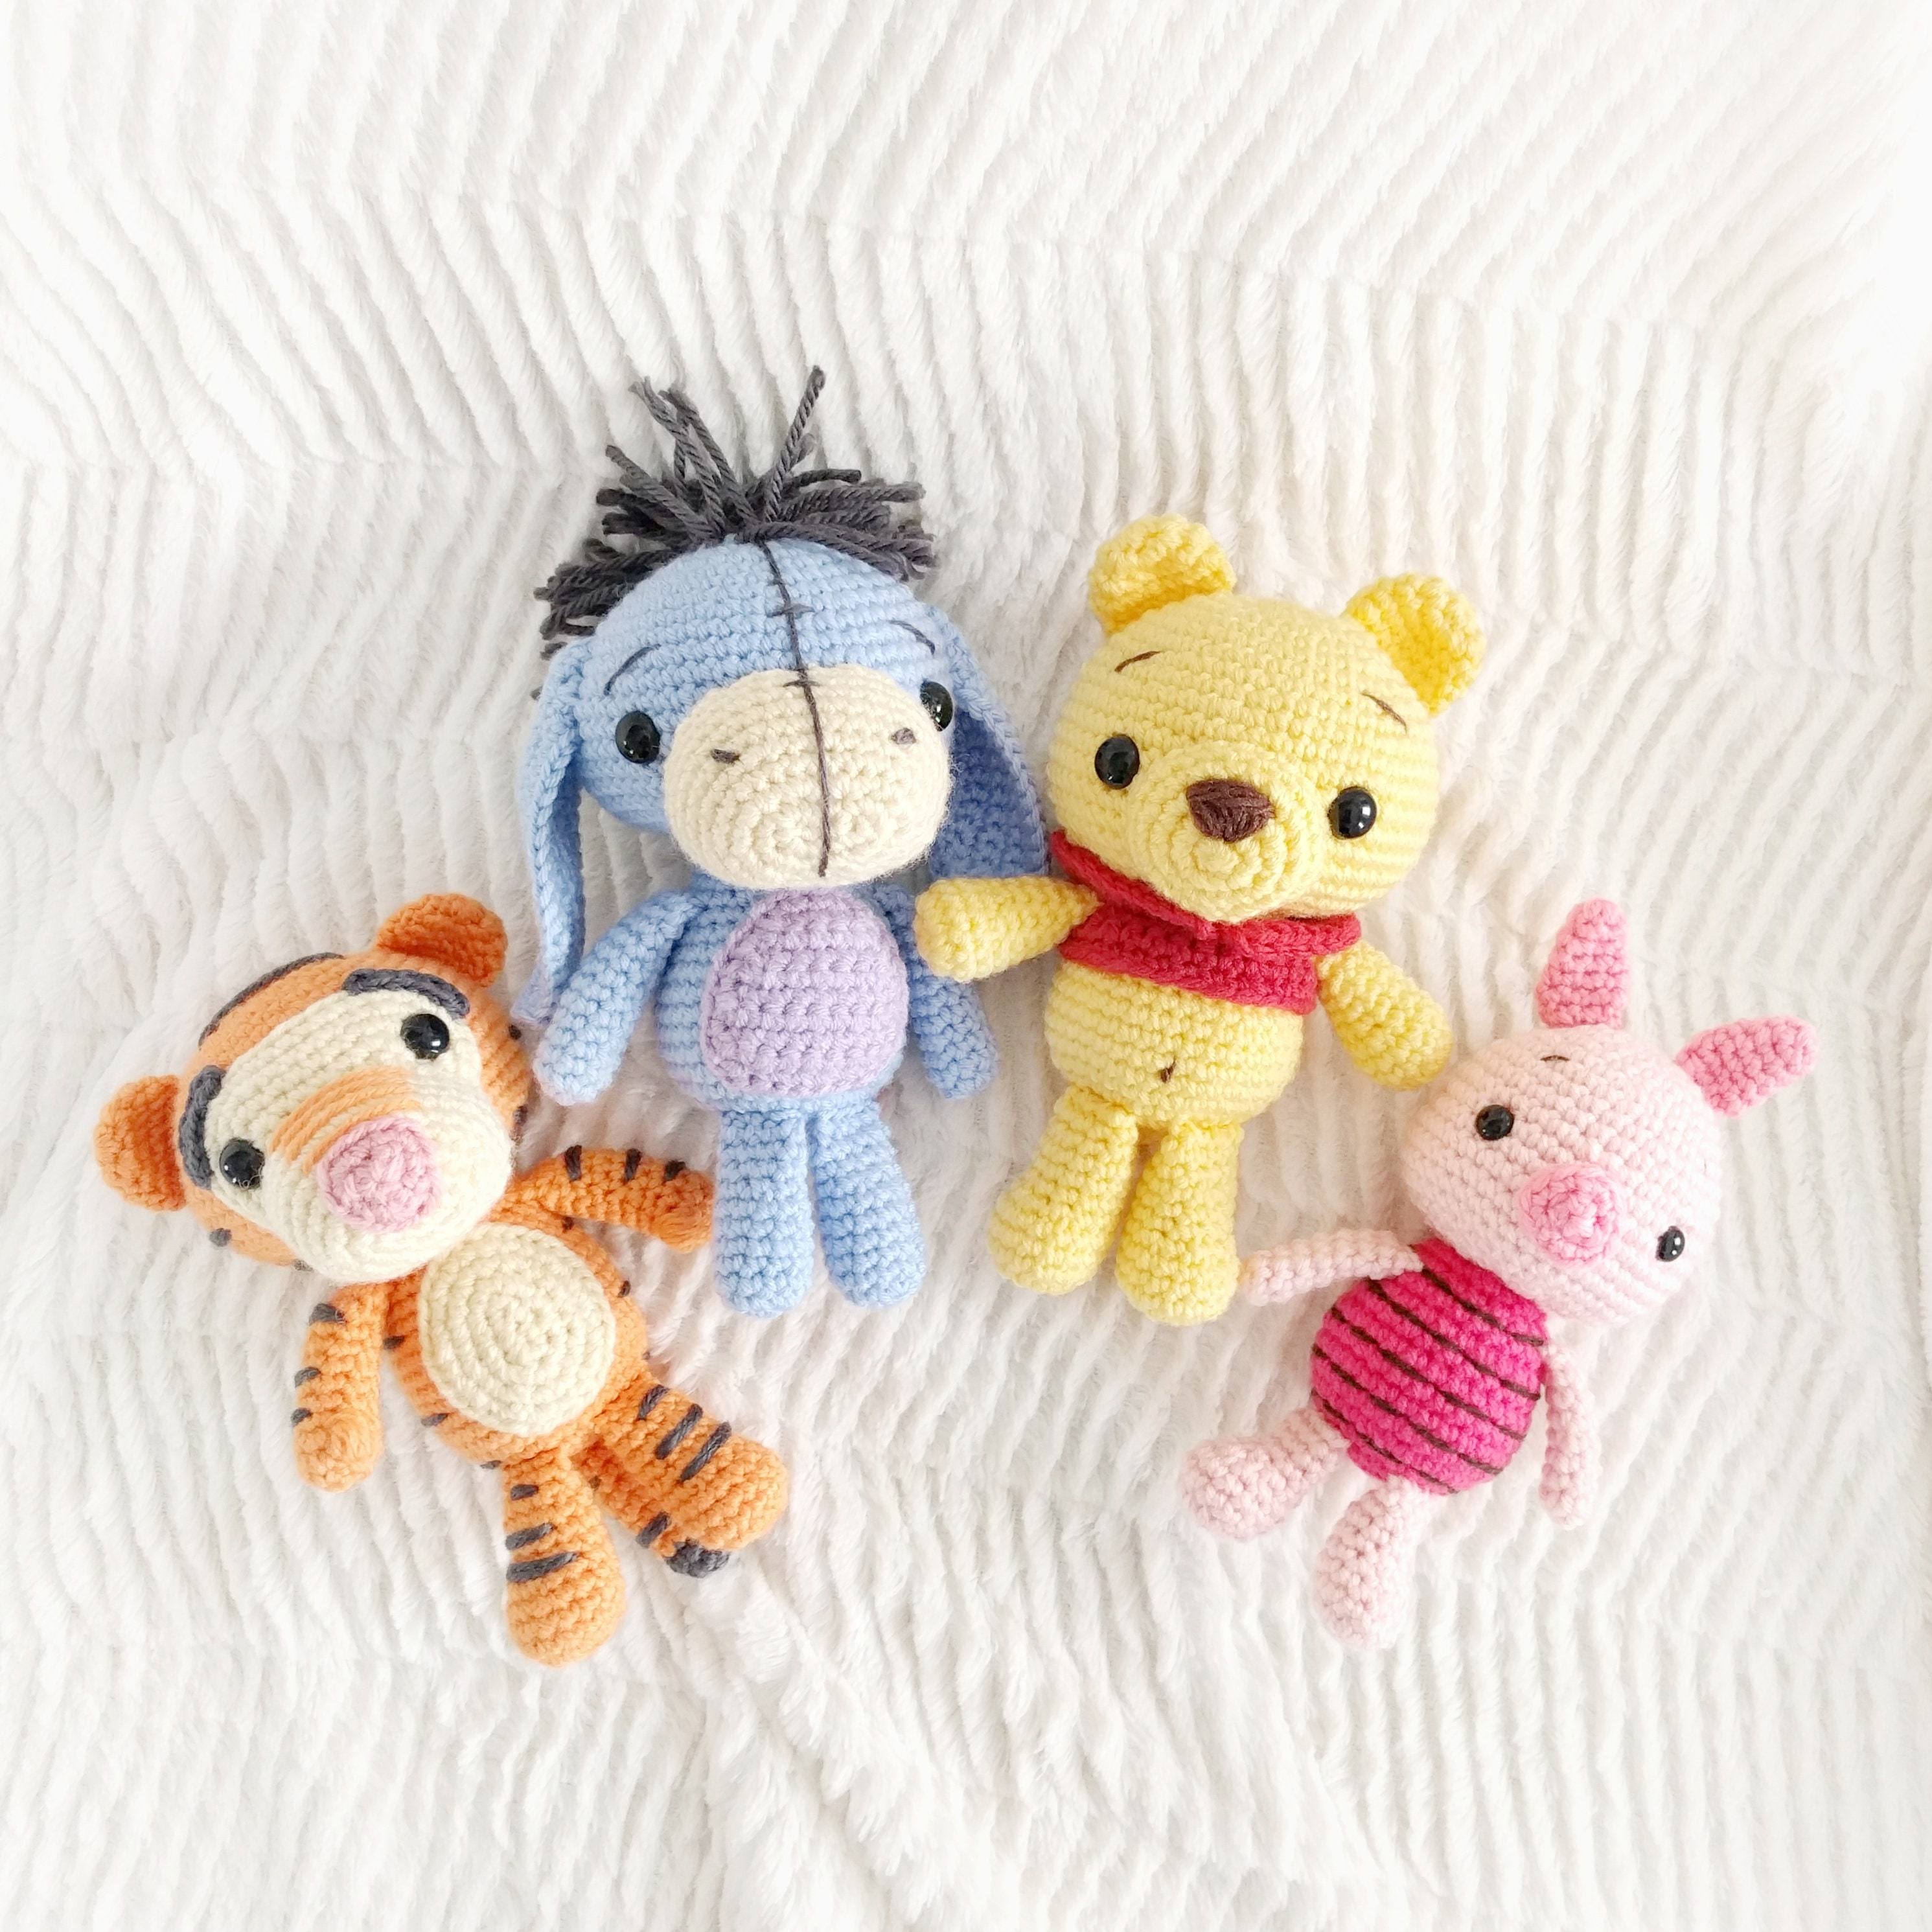 Ravelry: Piglet from Winnie the Pooh Amigurumi pattern by Tiny ... | 2982x2982